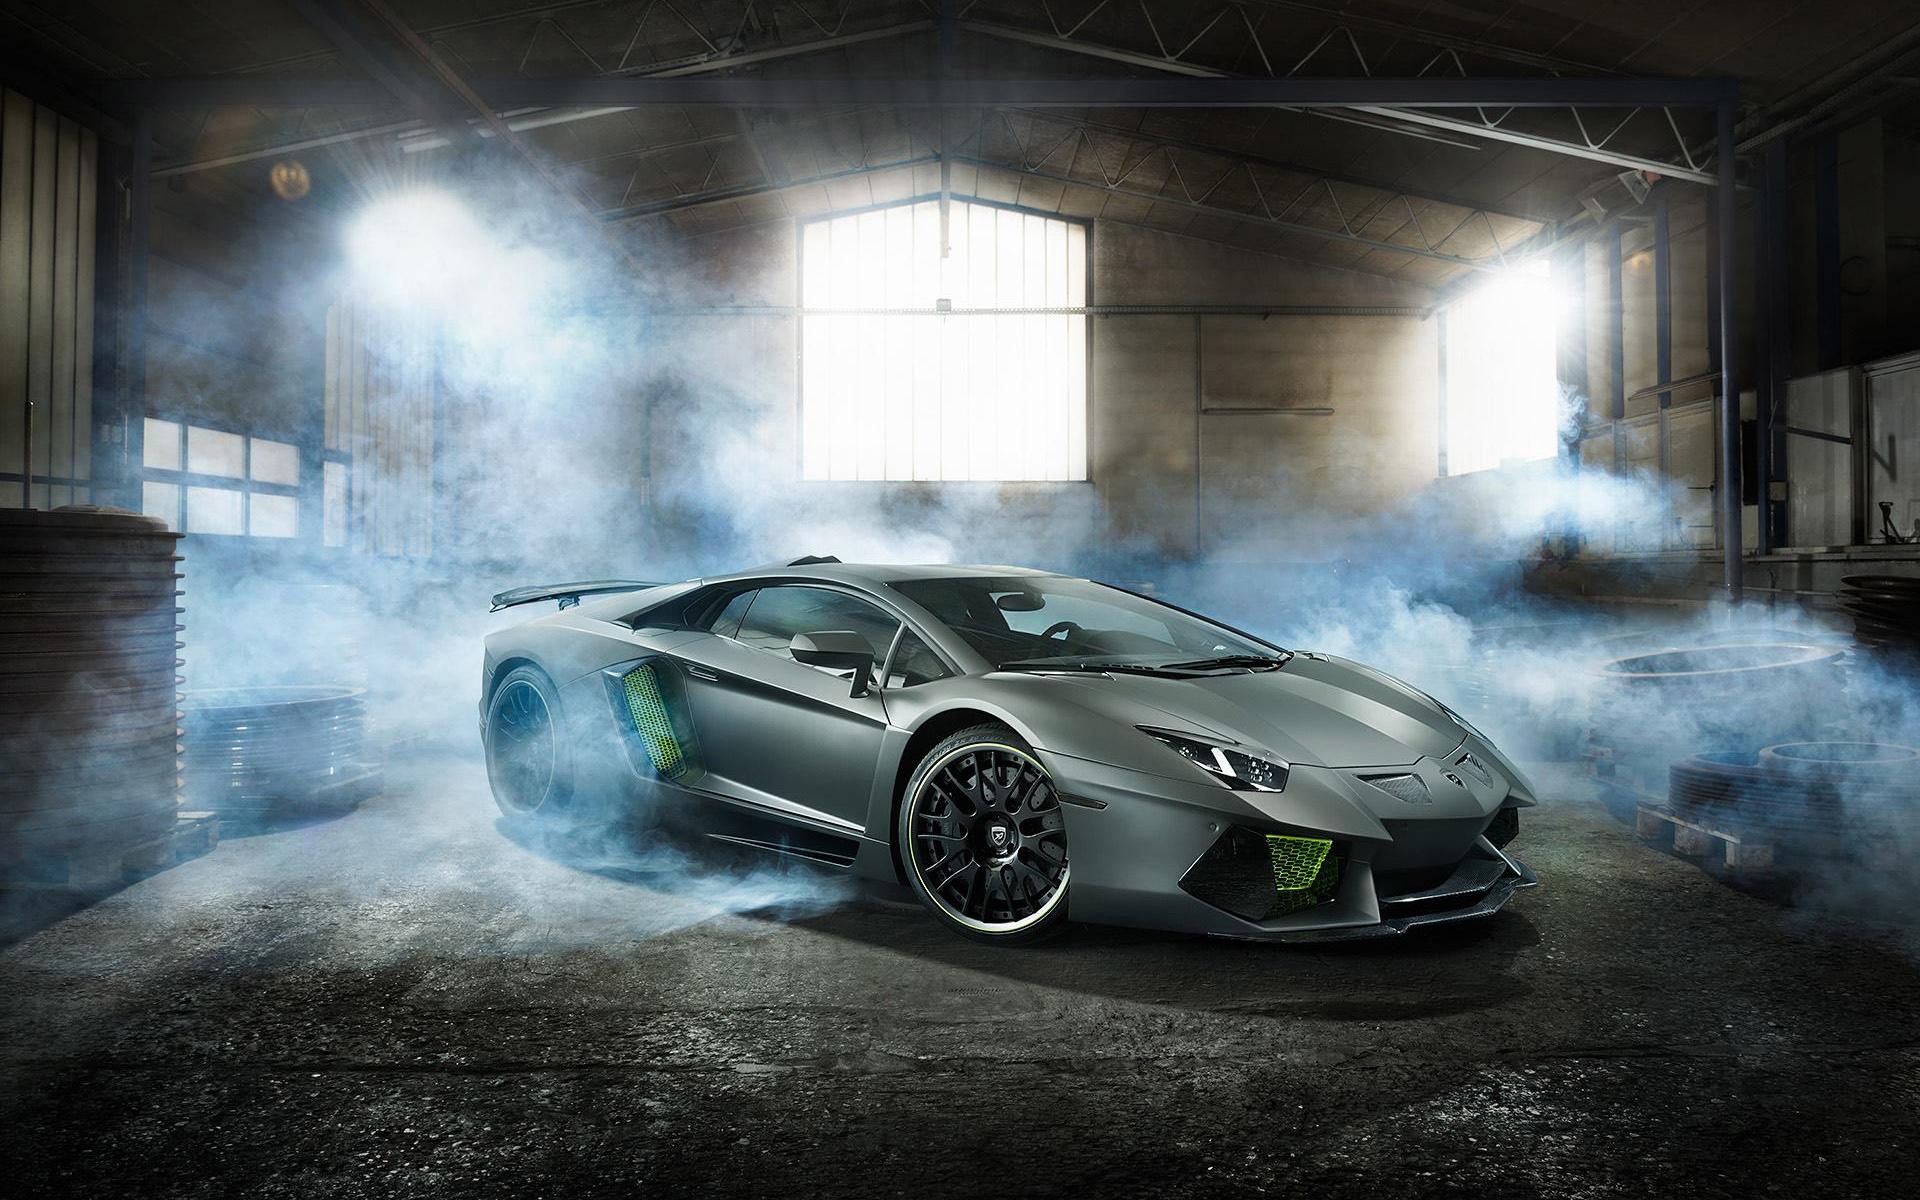 2014 Hamann Lamborghini Aventador Wallpapers HD Wallpapers 1920x1200